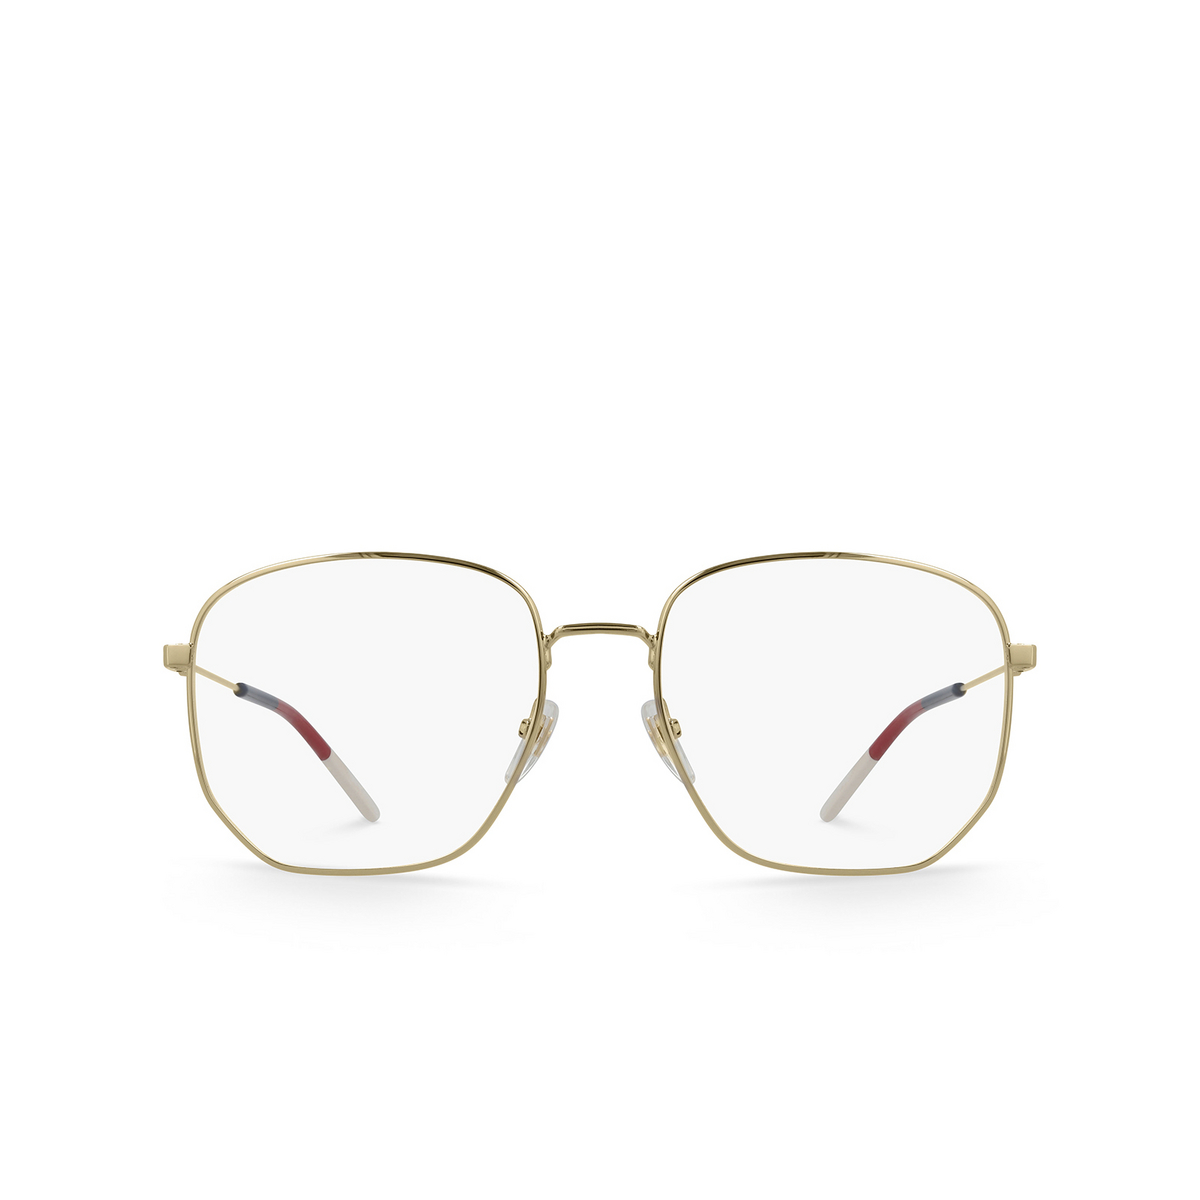 Gucci® Square Eyeglasses: GG0396O color Gold 002.